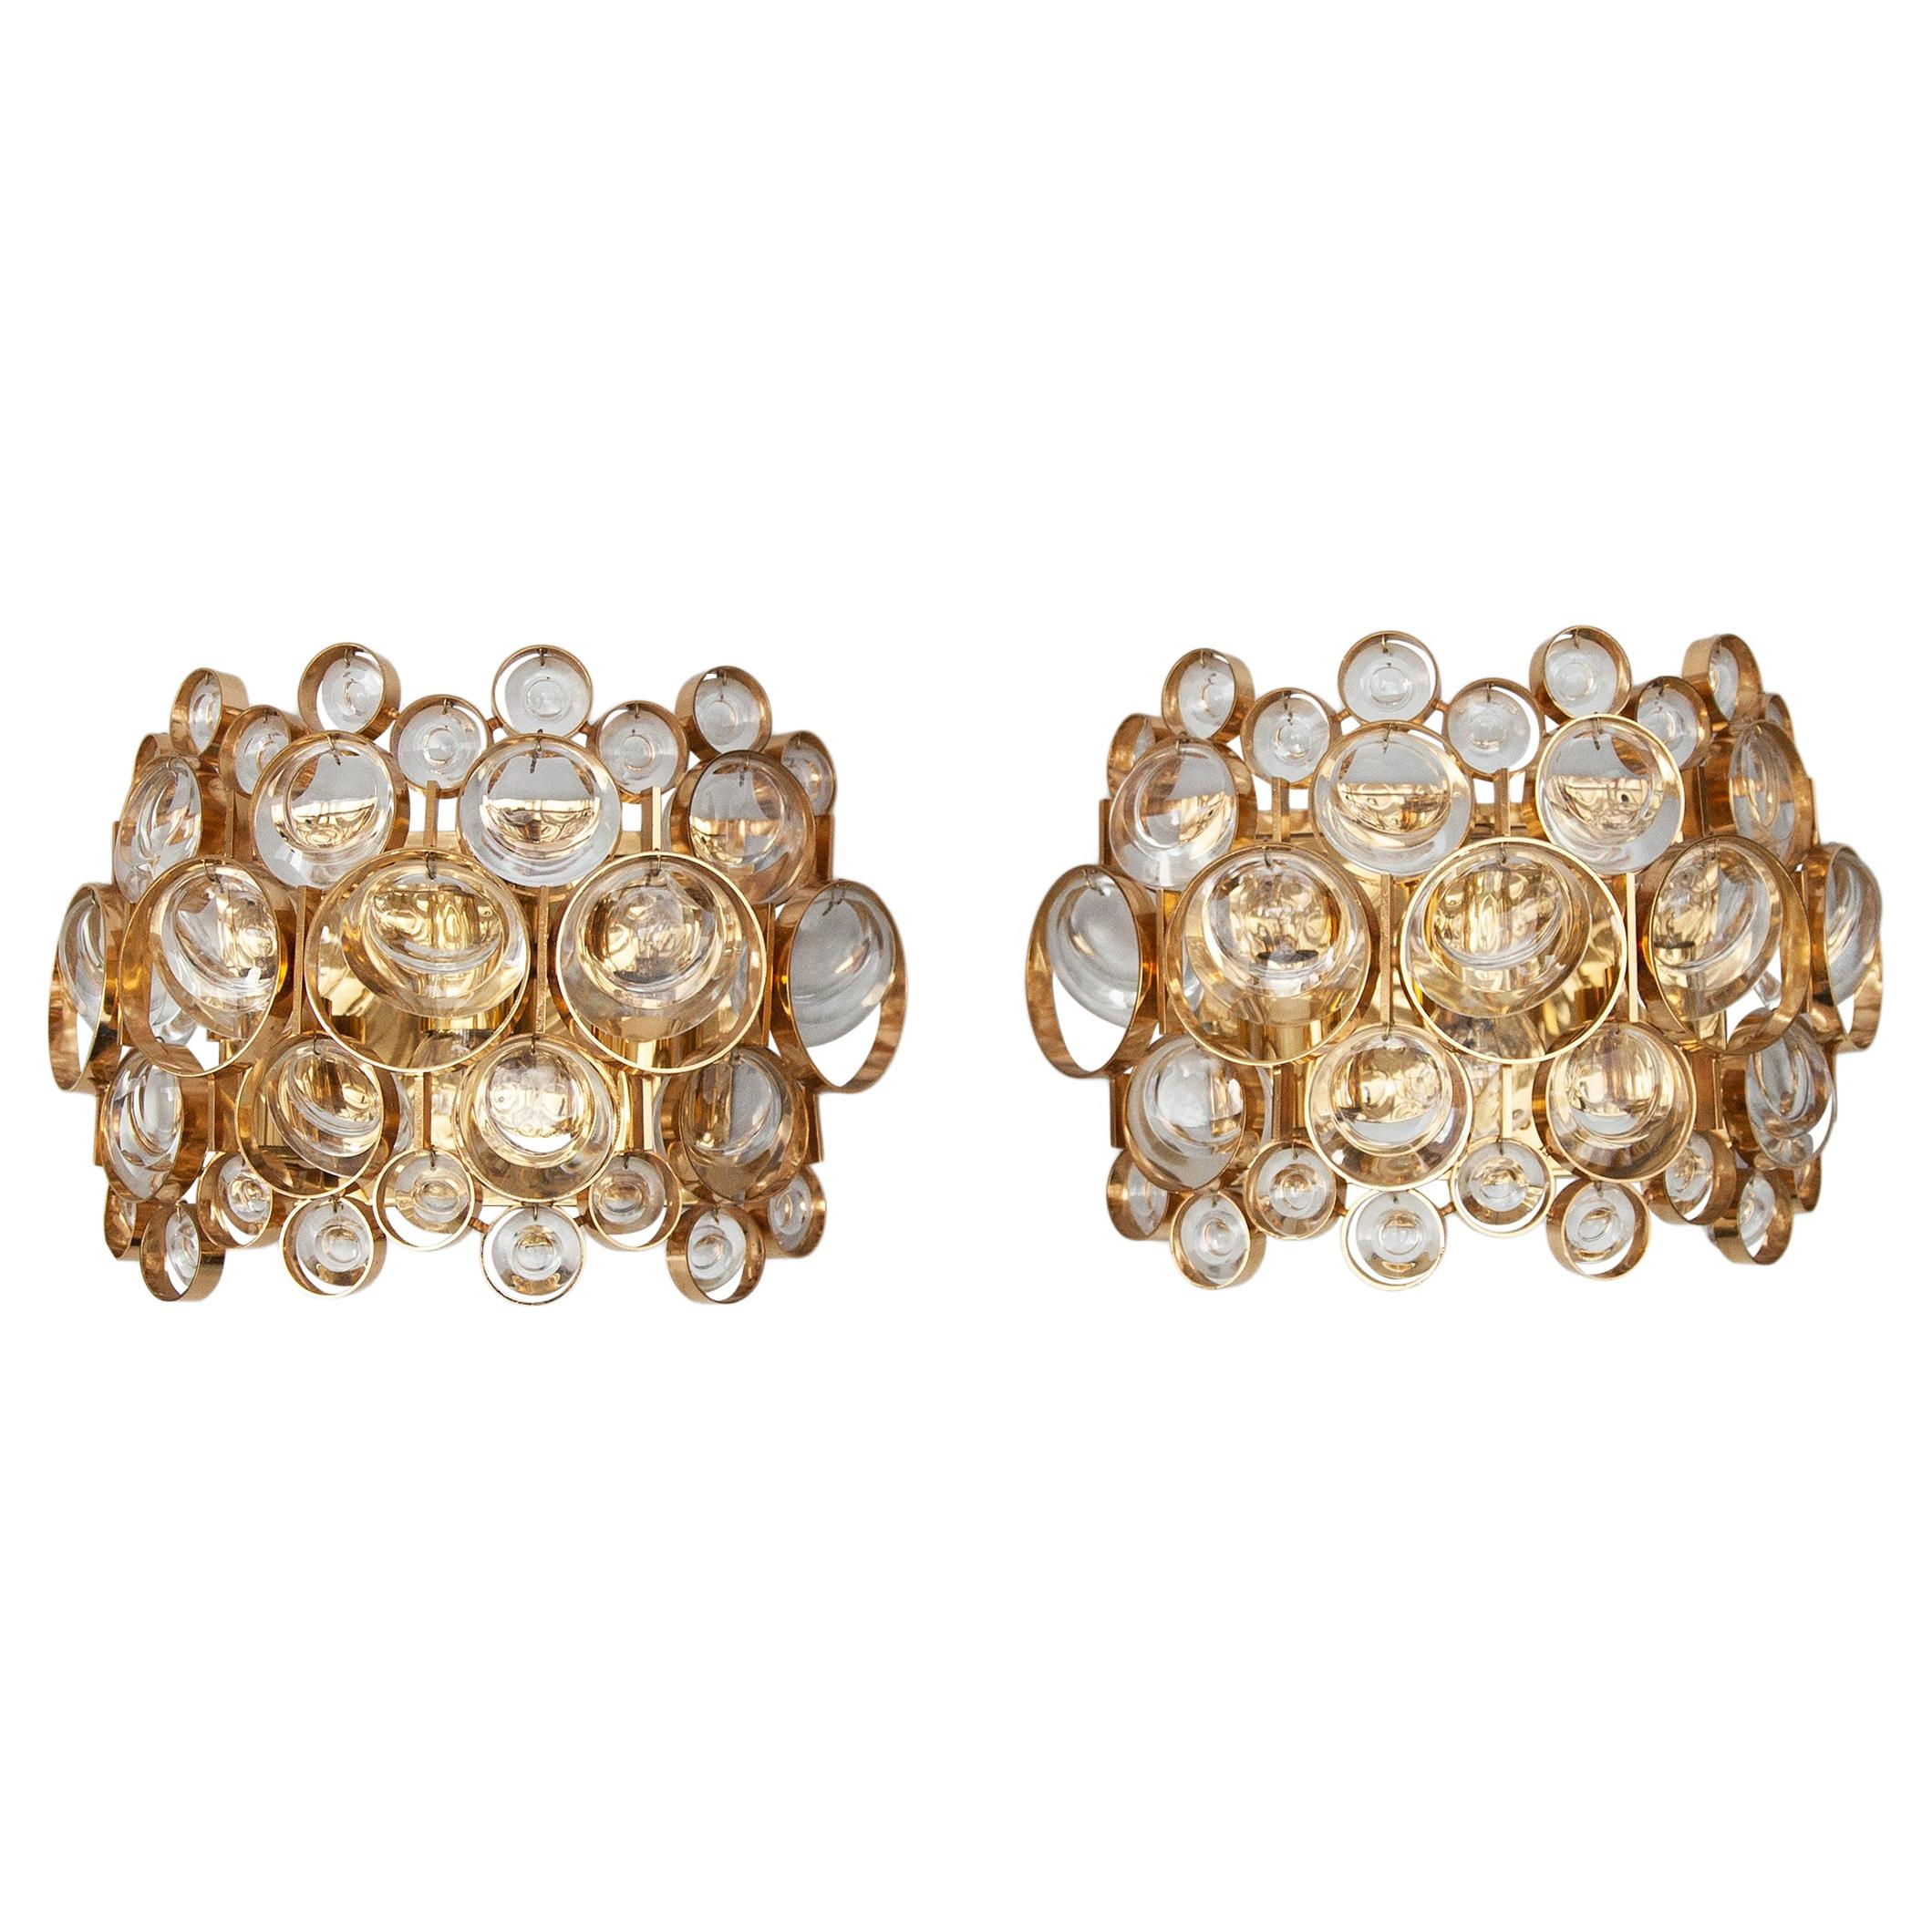 Palwa Gold Plated Jewel Crystal Glass Sconces, Germany, 1960s